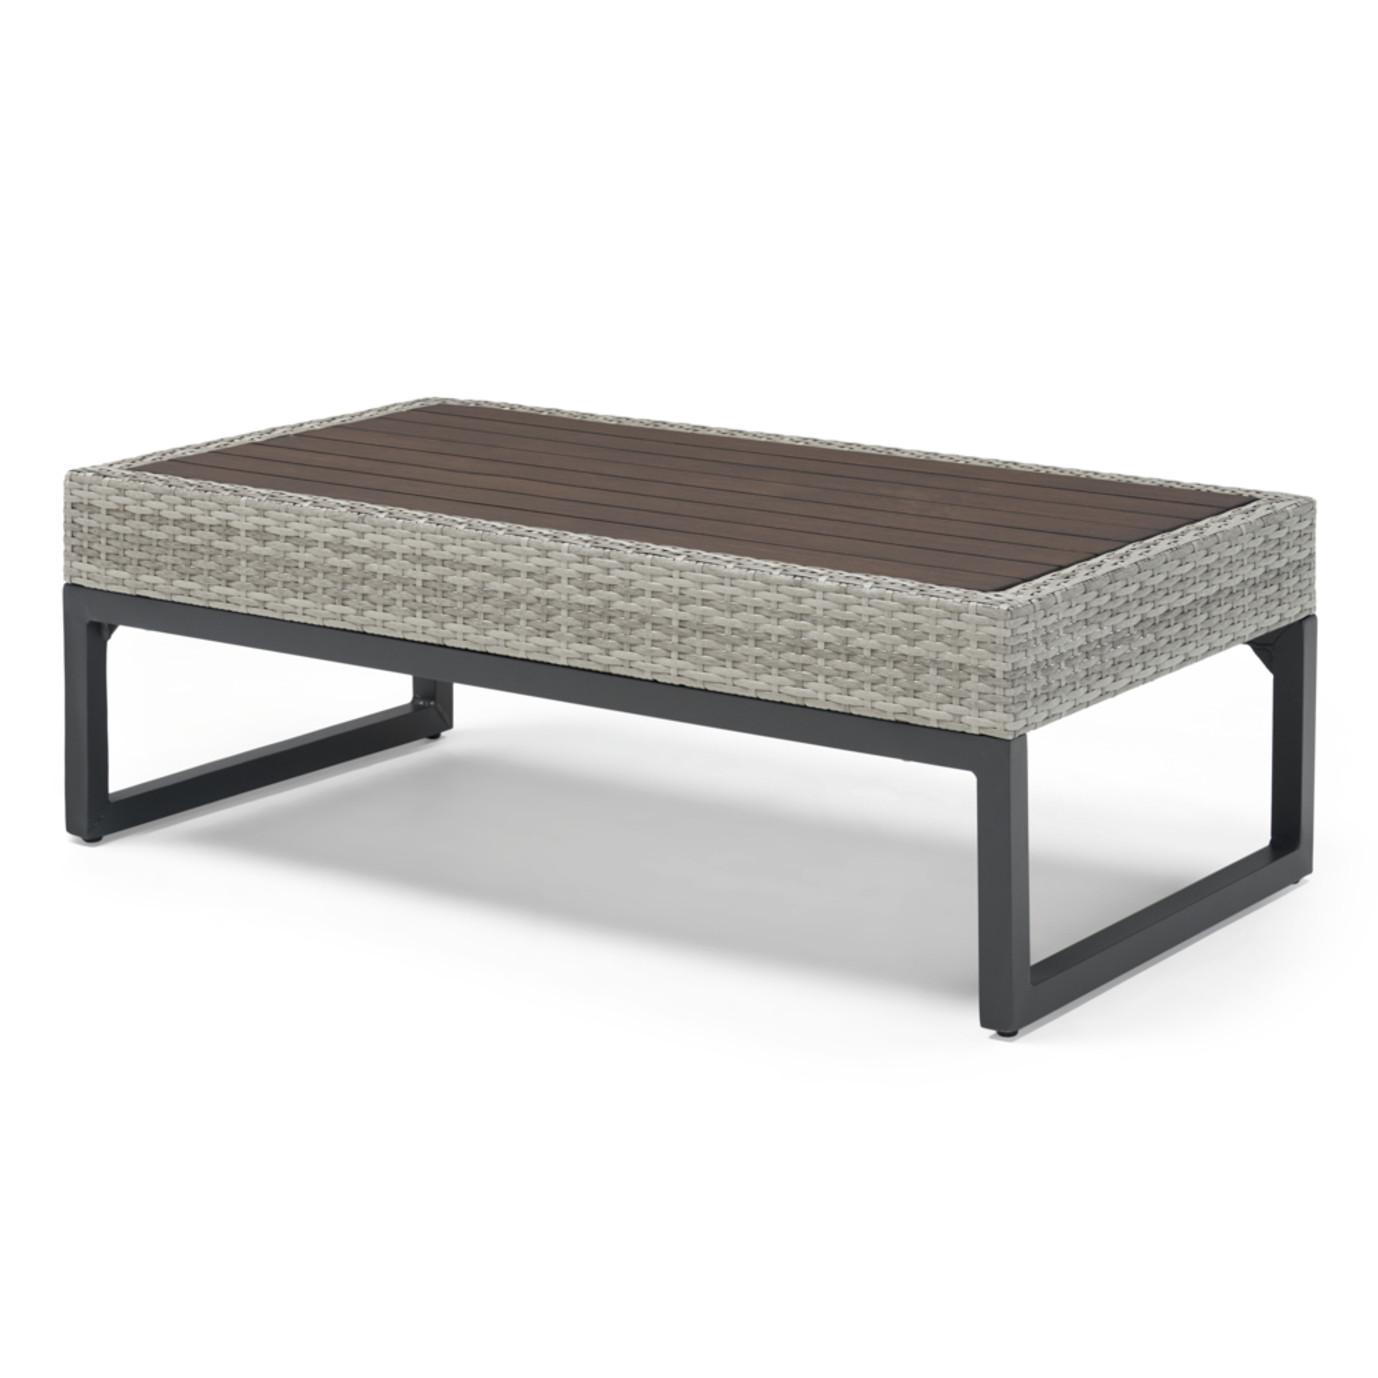 Milo™ Gray 4 Piece Seating Set - Spa Blue